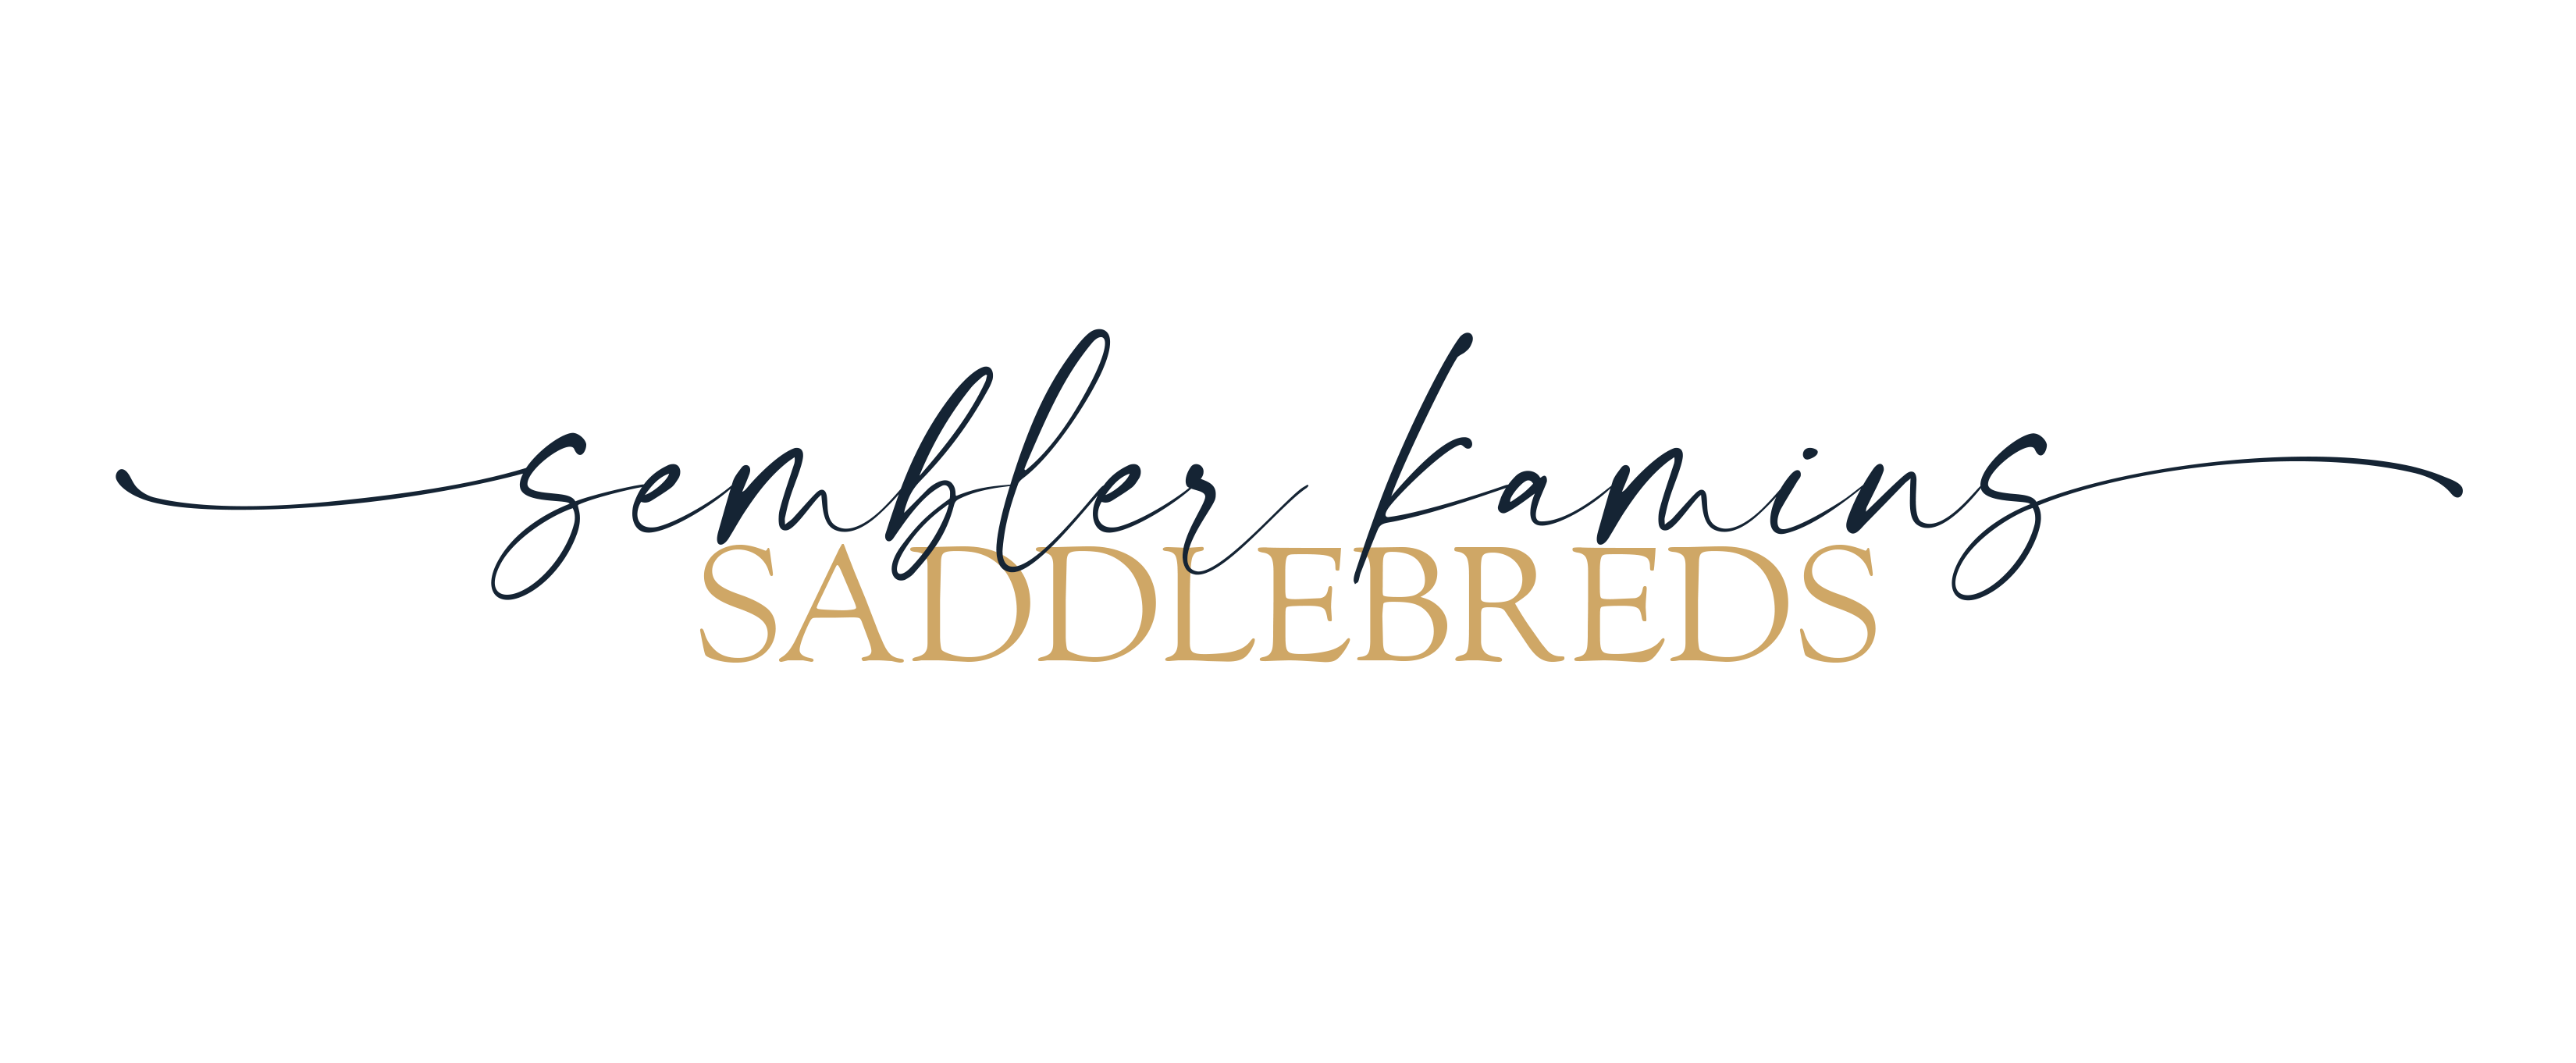 Sembler-Kamins Saddlebreds